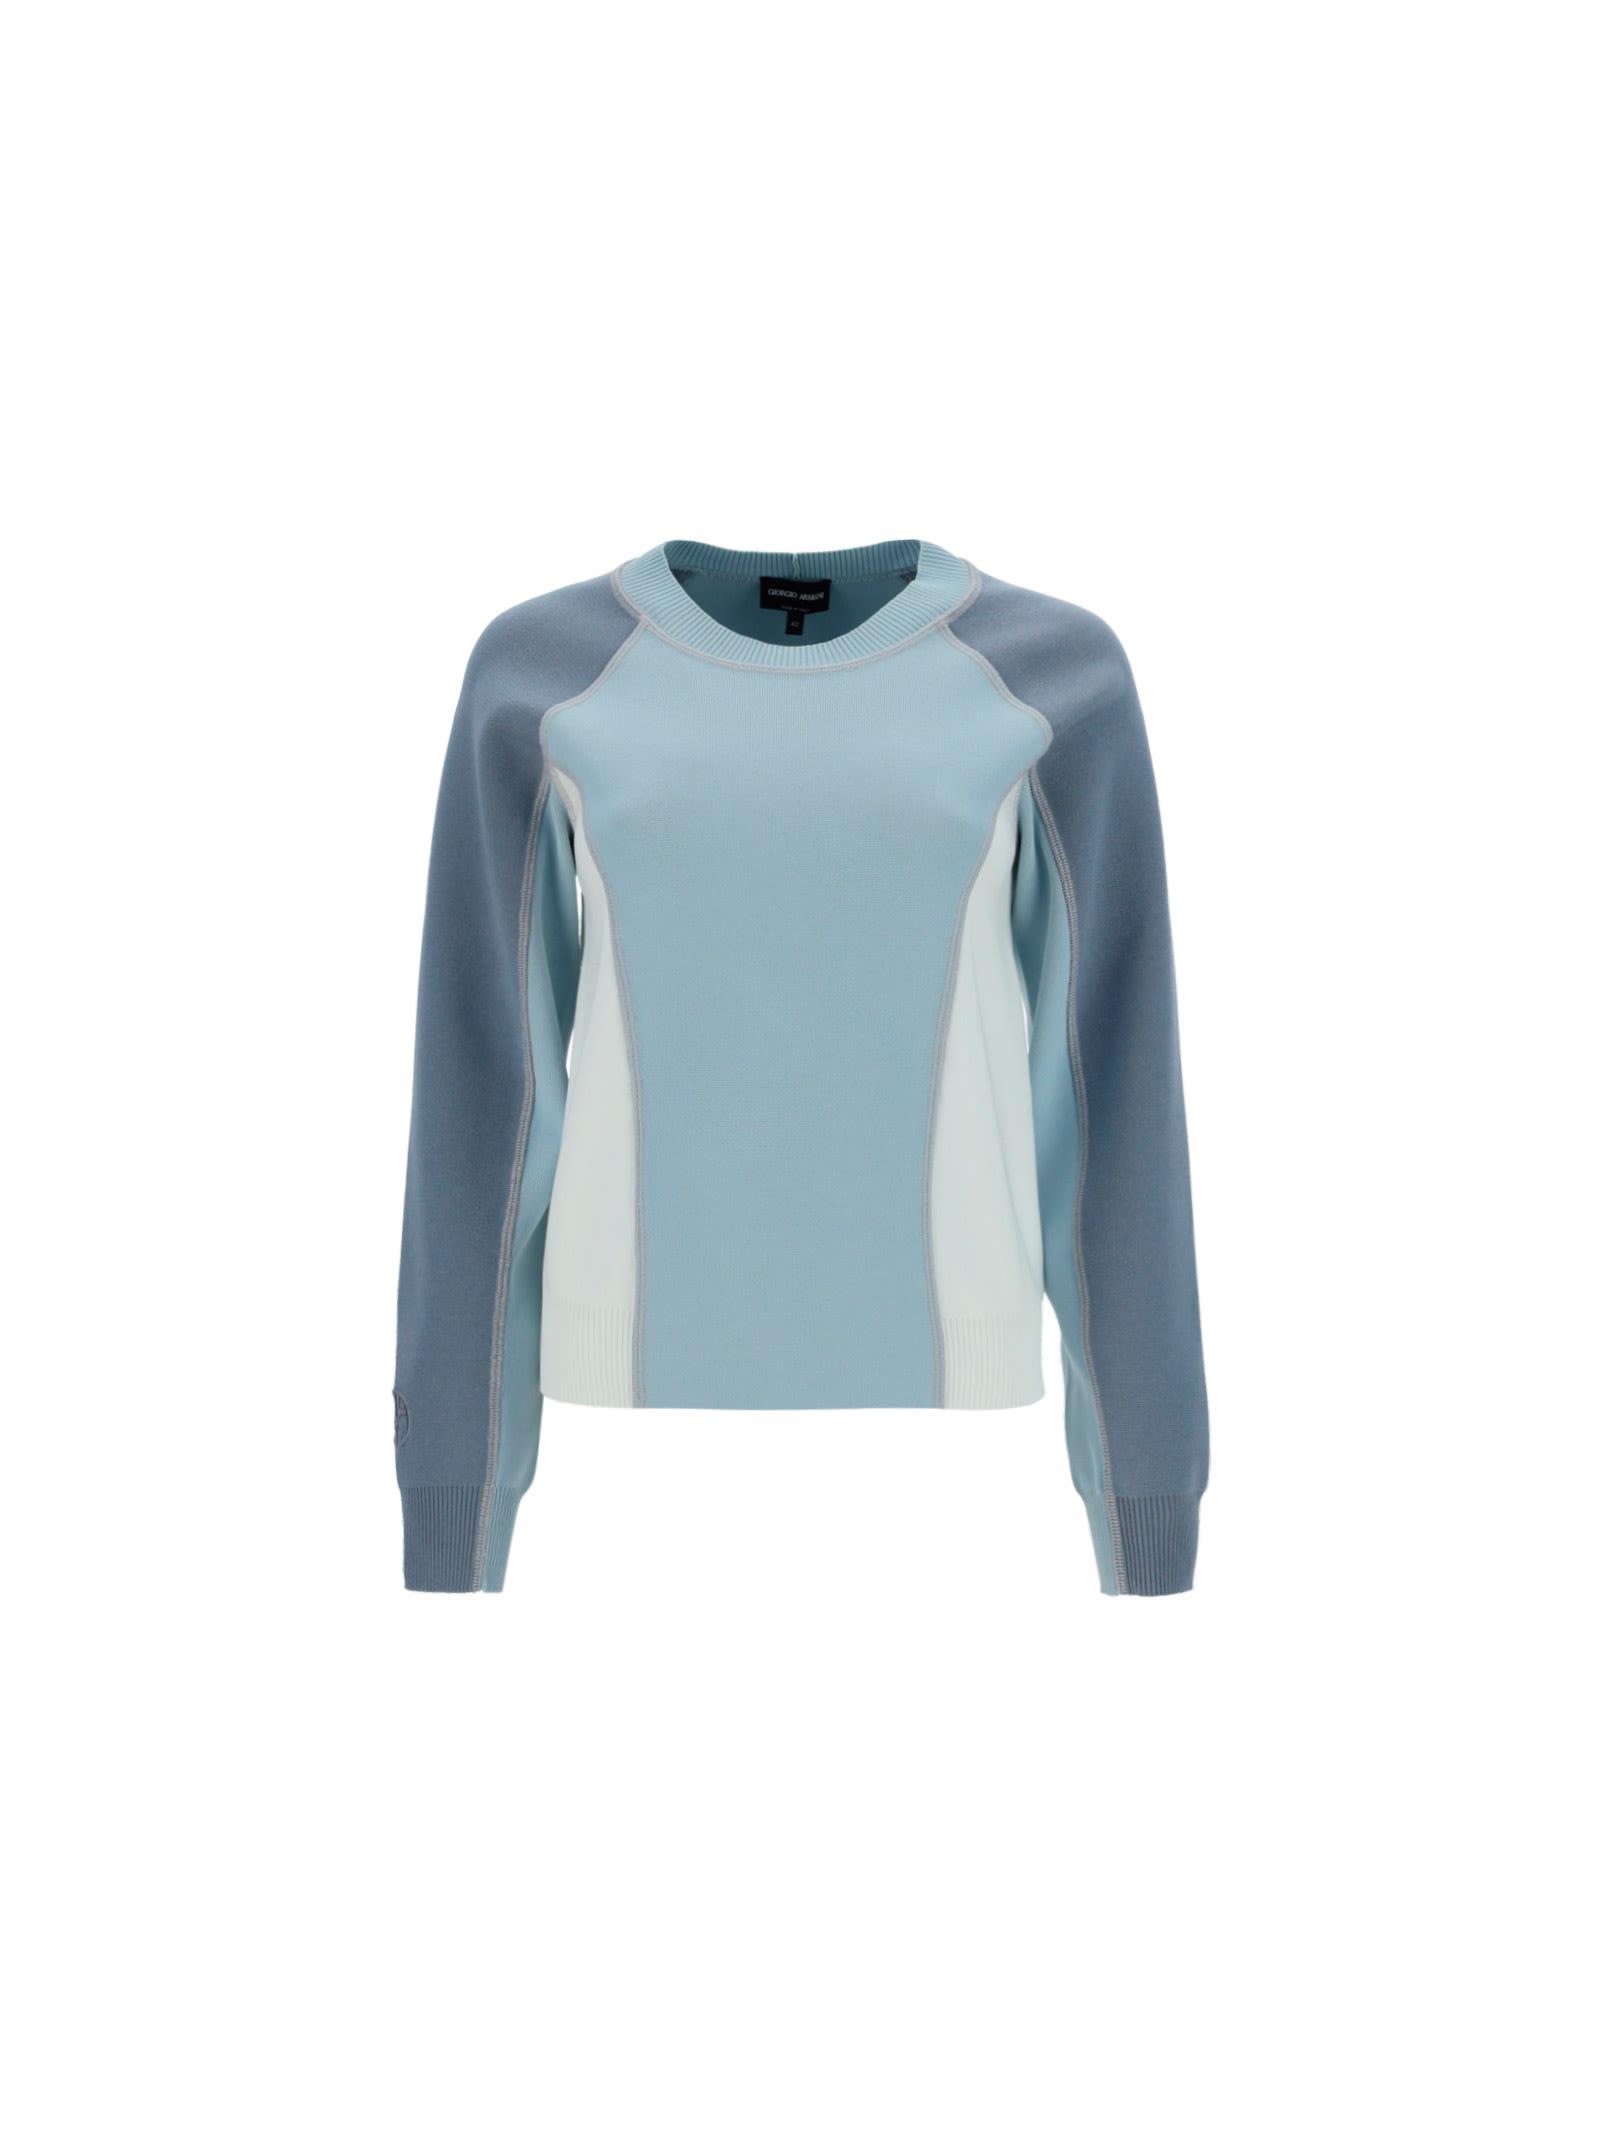 Giorgio Armani Sweaters SWEATER